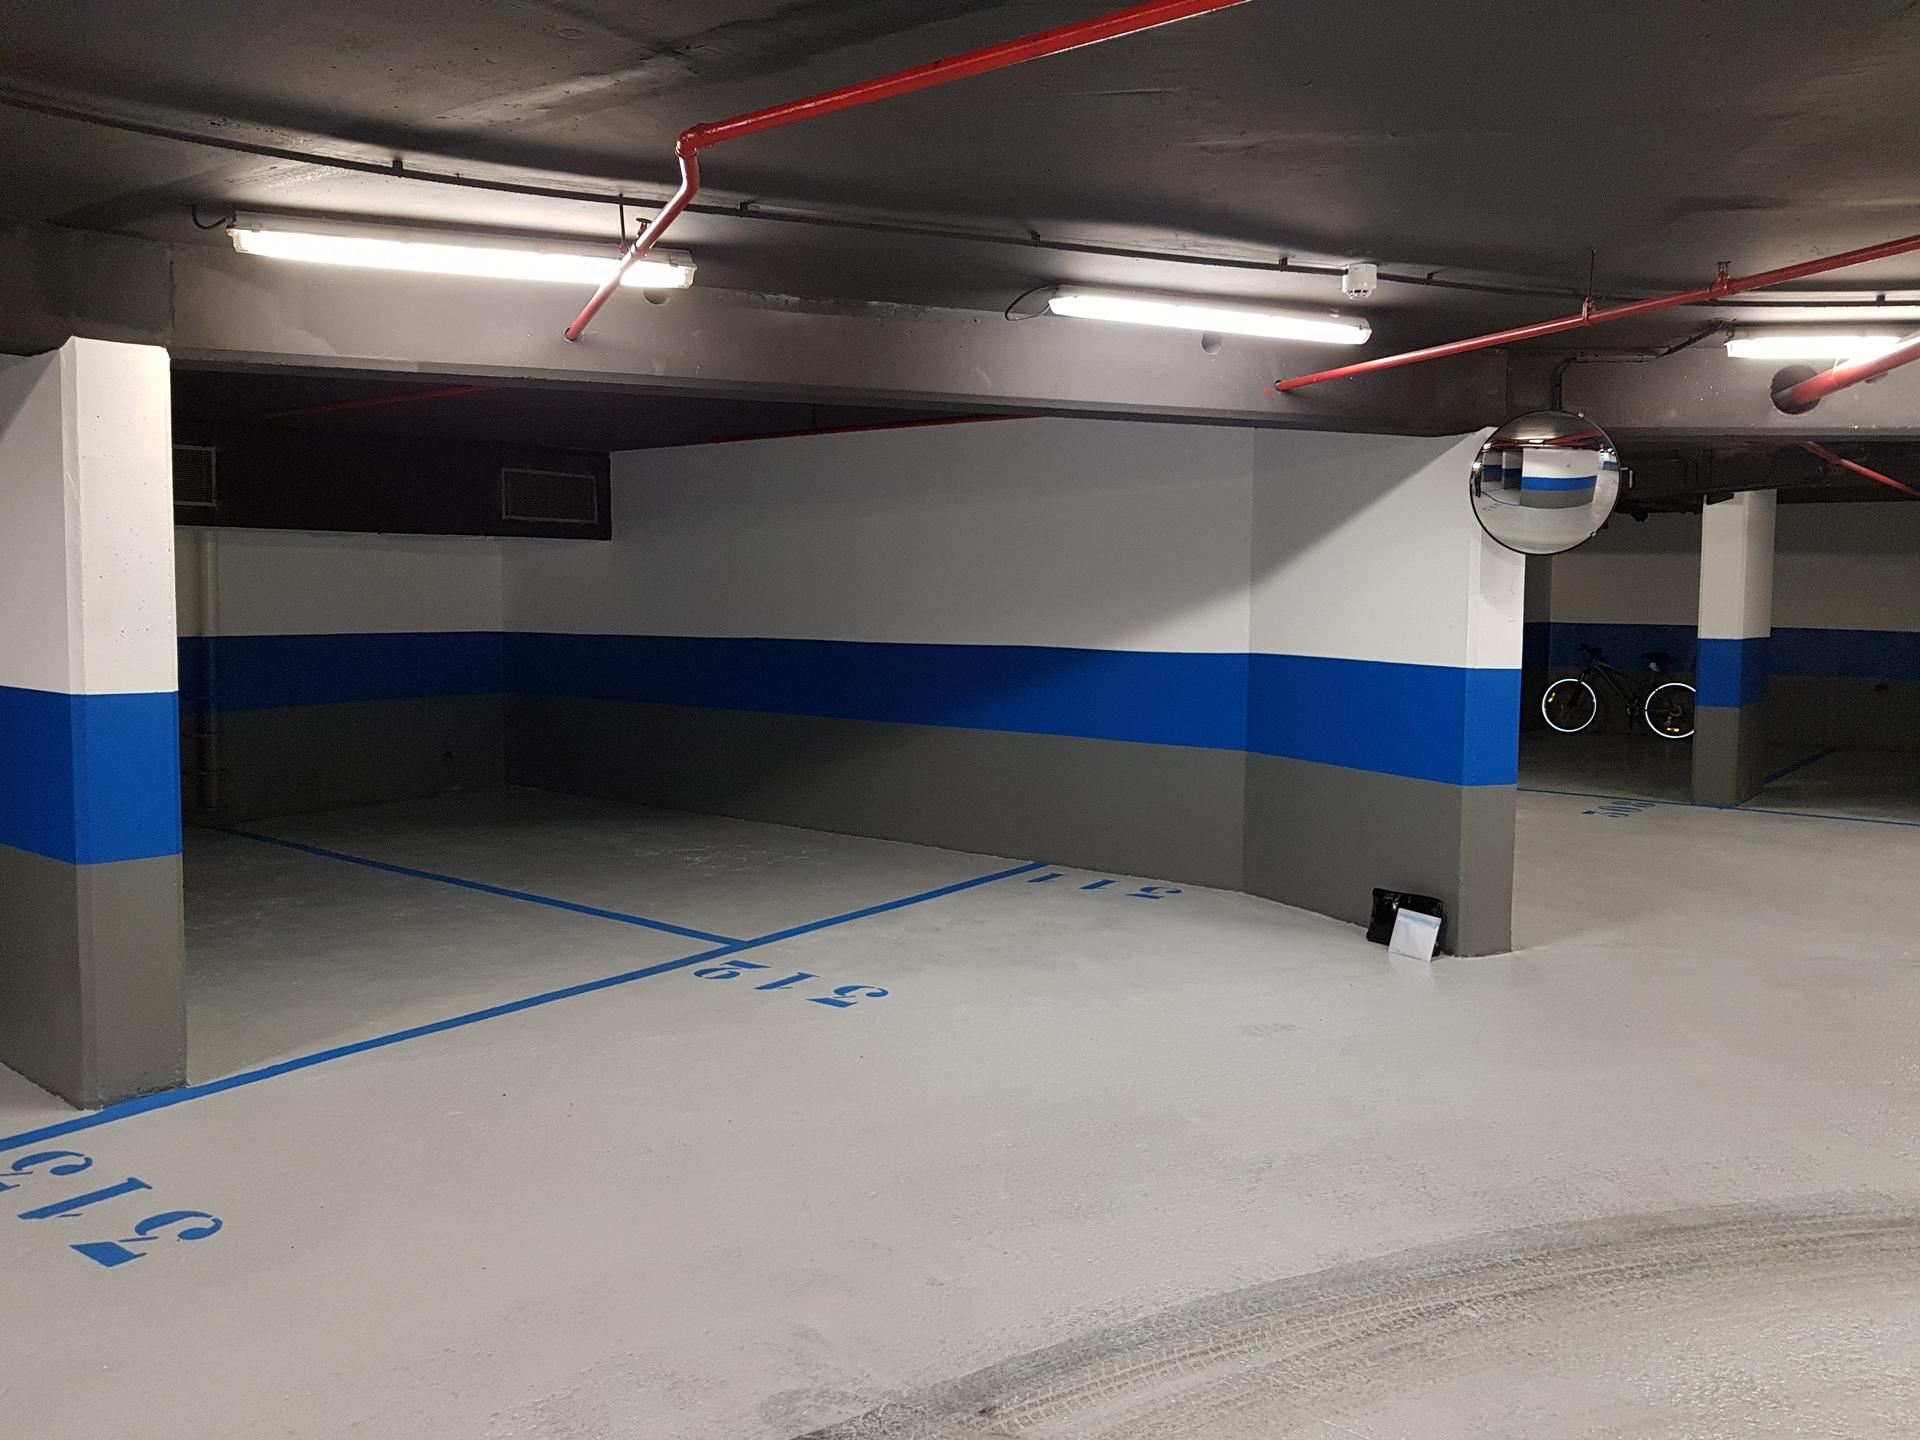 location prince de galles emplacement de parking louer monaco monte carlo. Black Bedroom Furniture Sets. Home Design Ideas